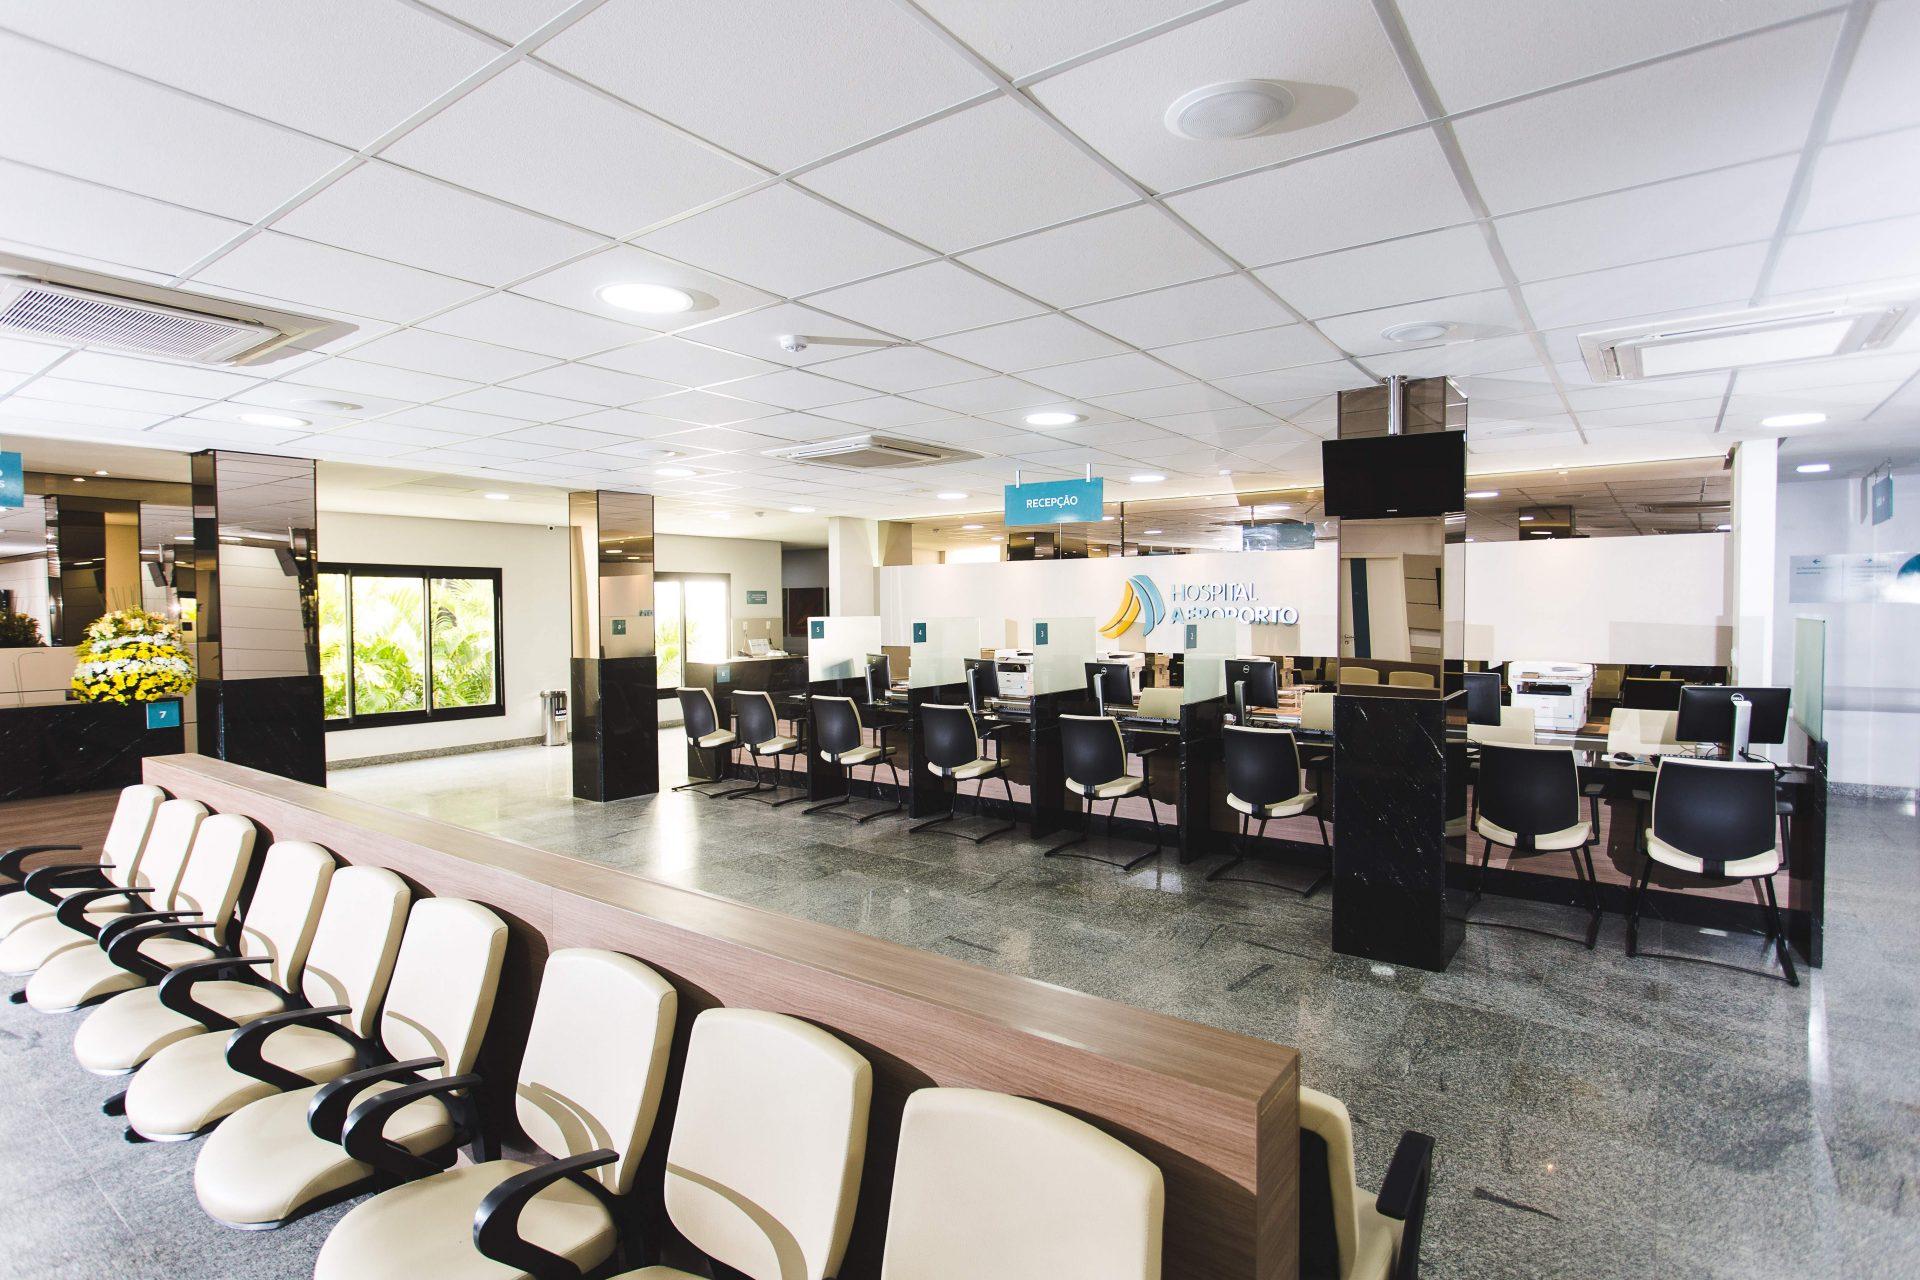 ambulatório hospital aeroporto